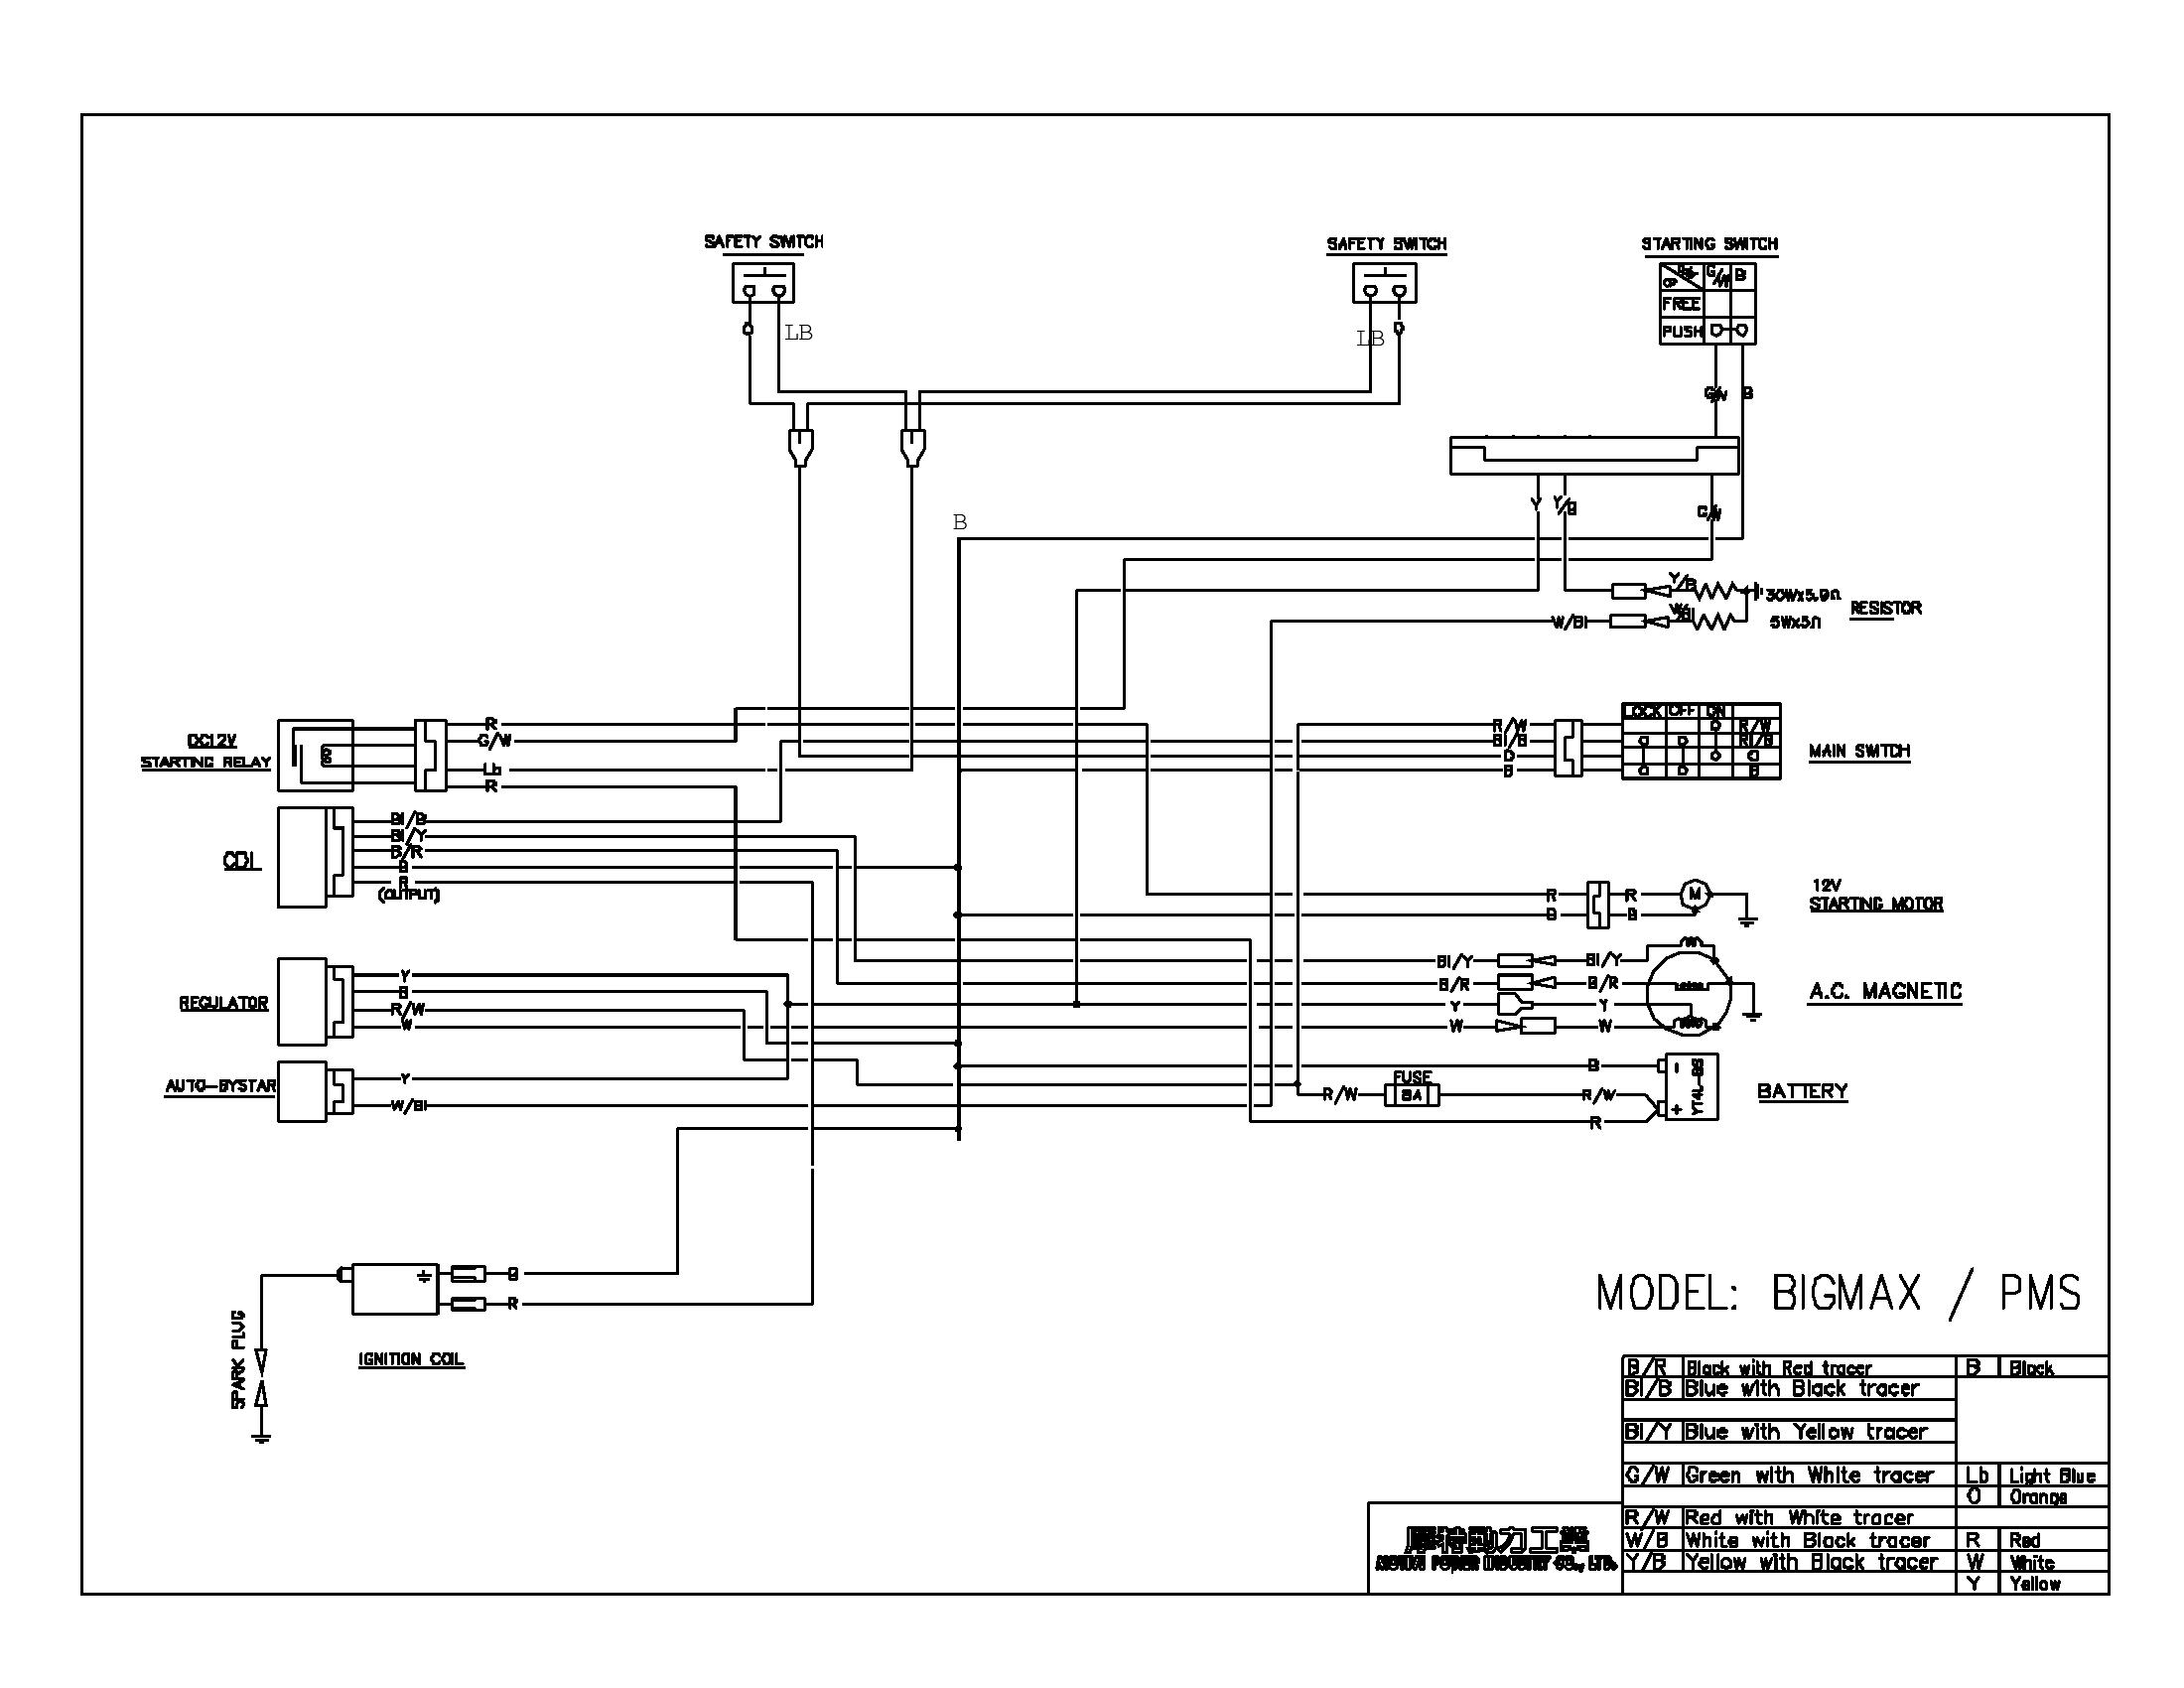 50cc moped wiring diagram headlights aa 6232  buddy scooter wiring diagram free diagram  aa 6232  buddy scooter wiring diagram